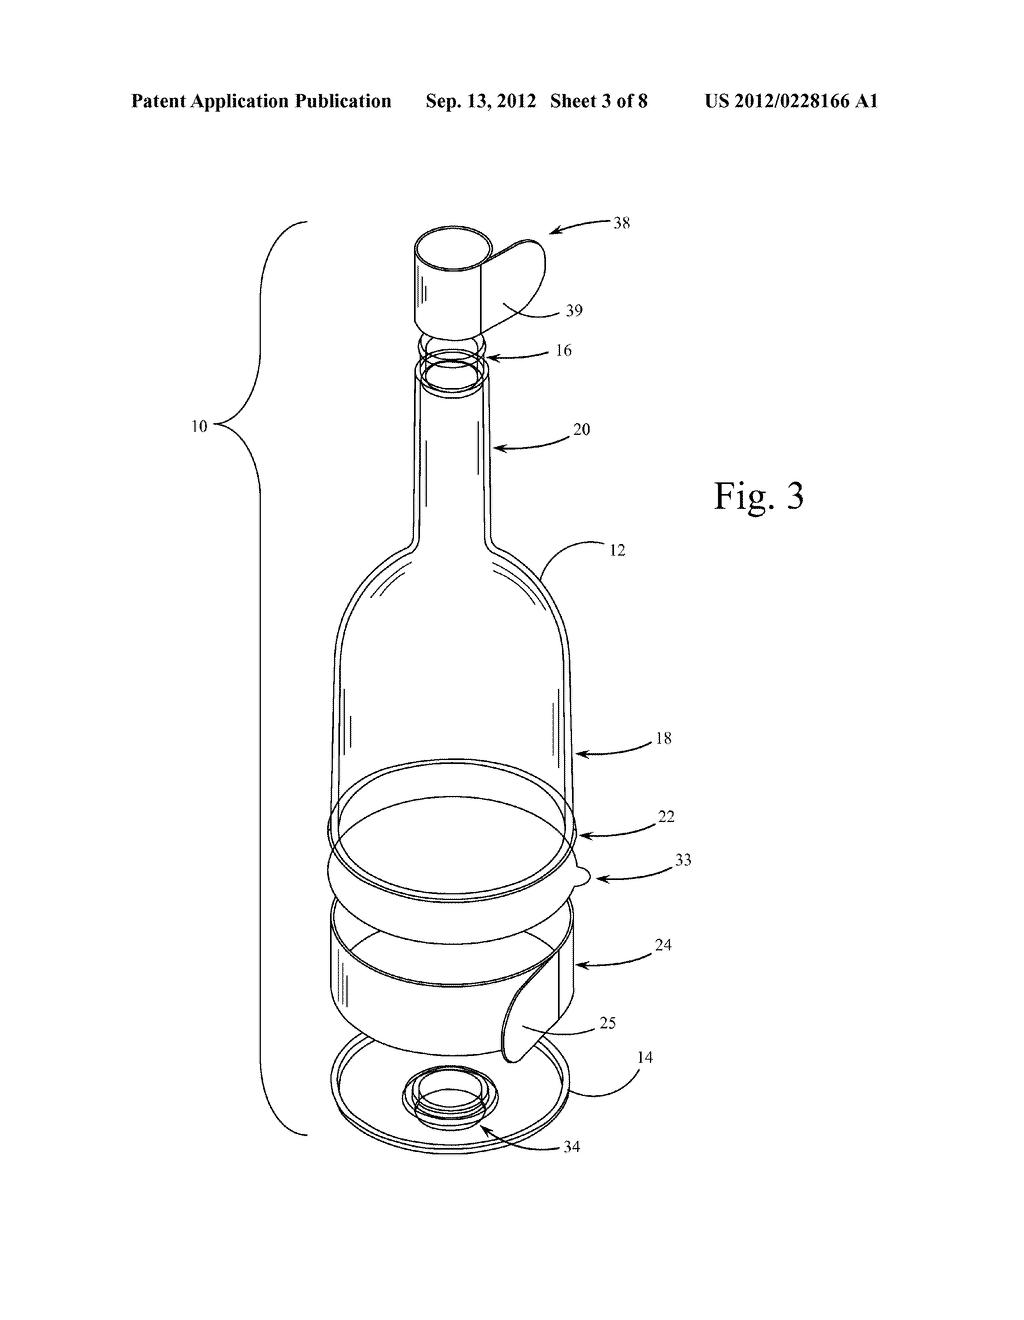 single serve combination wine bottle and wine glass diagram rh patentsencyclopedia com Bottle Beer Glass Diagram Bottle Beer Glass Diagram